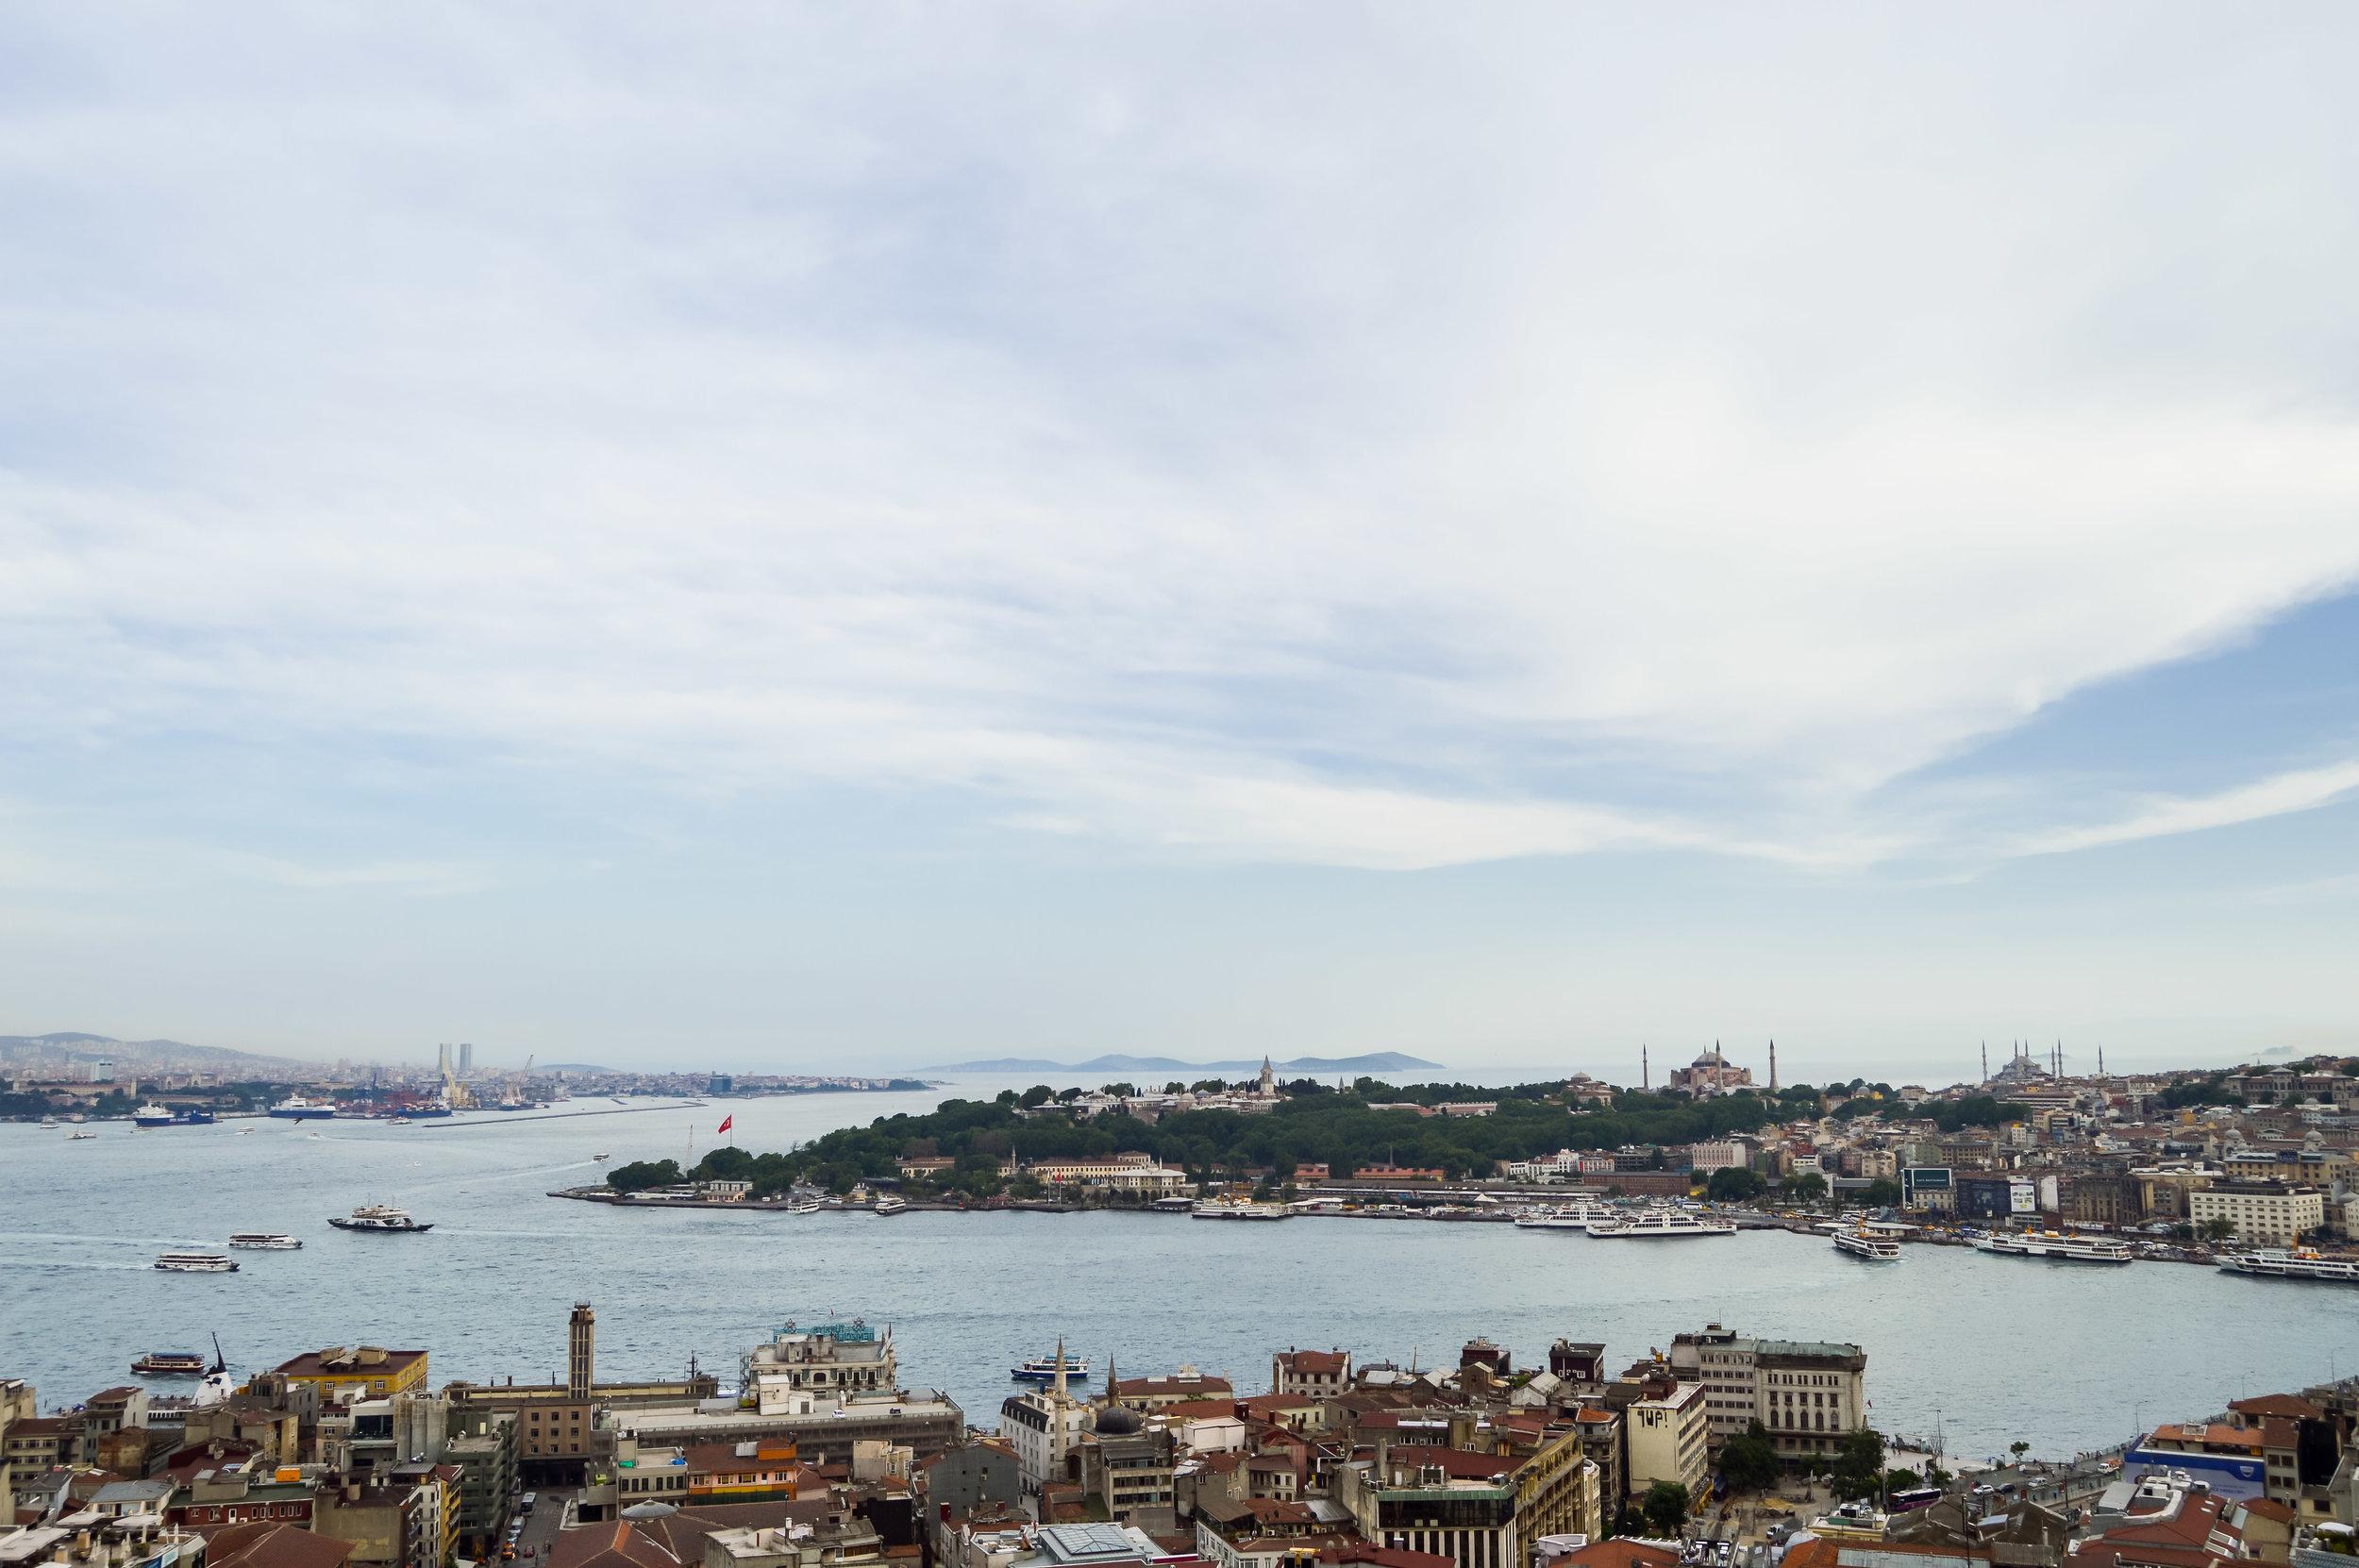 View from Galata Tower Rowhomes Mosques Skyline Bosporus Bosphorus Blue Sky Muslim Ottoman Empire Architecture Istanbul Turkey